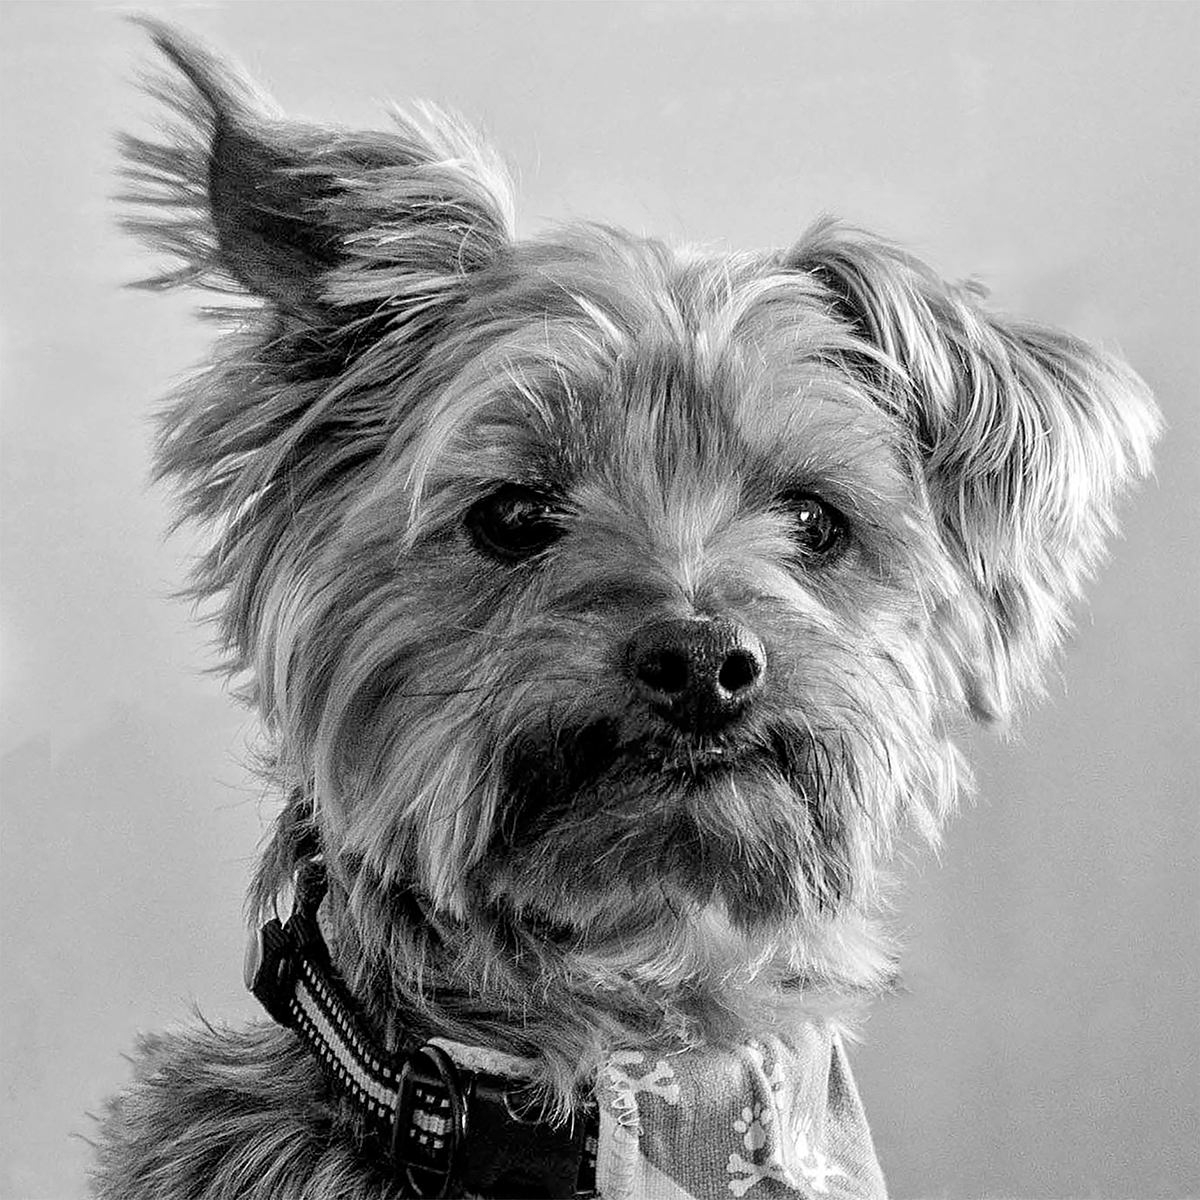 1ST CASTLEBAY DOG BY WILLIAM GEORGE DIV 3 MONO